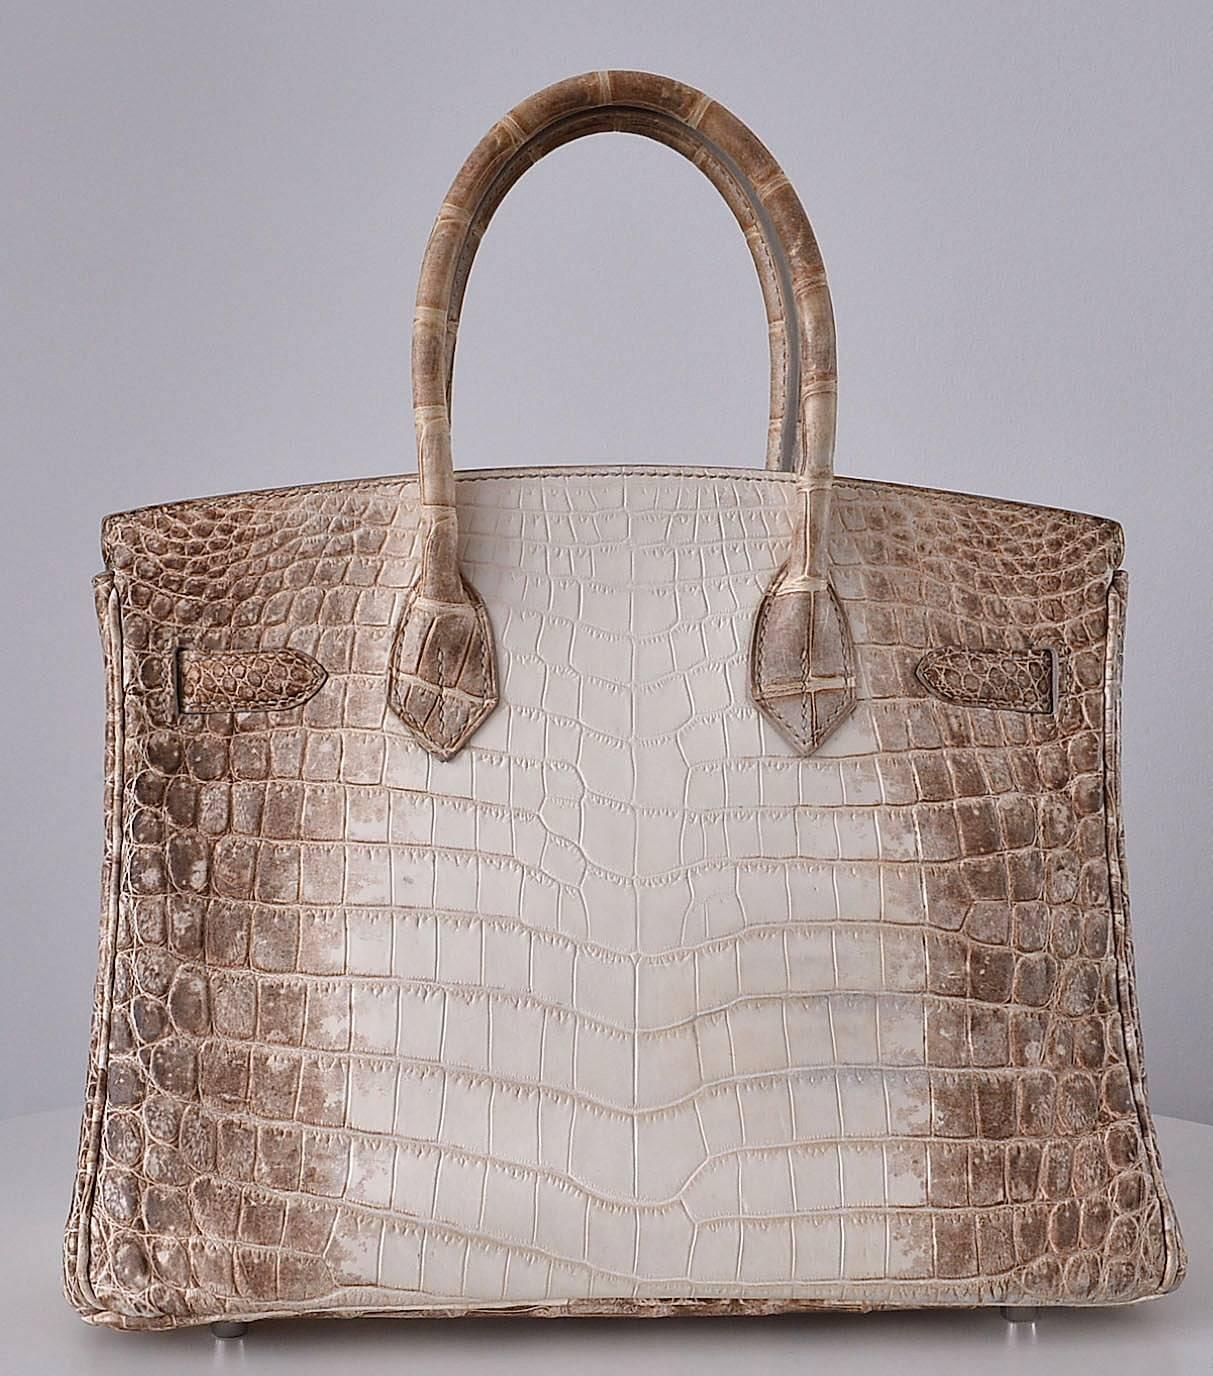 hermes replica handbags - HERMES BIRKIN BAG 30cm HIMALAYAN WHITE NILOTICUS CROCODILE stamp M ...